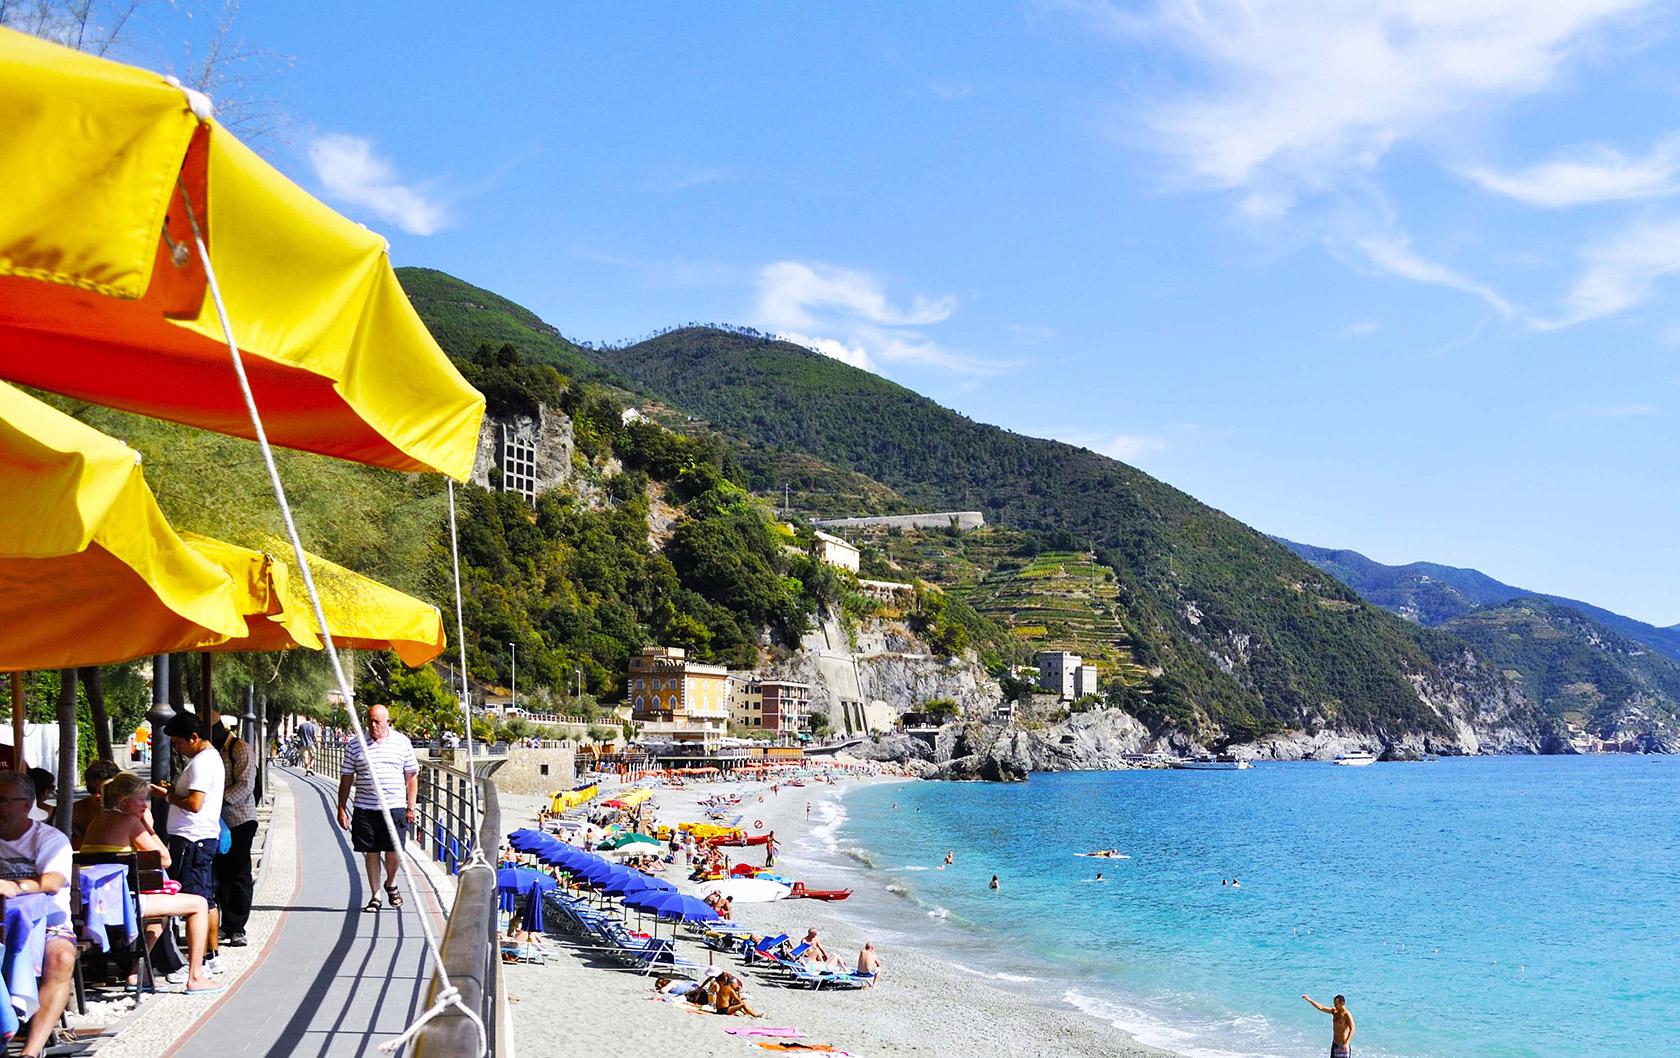 Enjoying the Beach in Italy